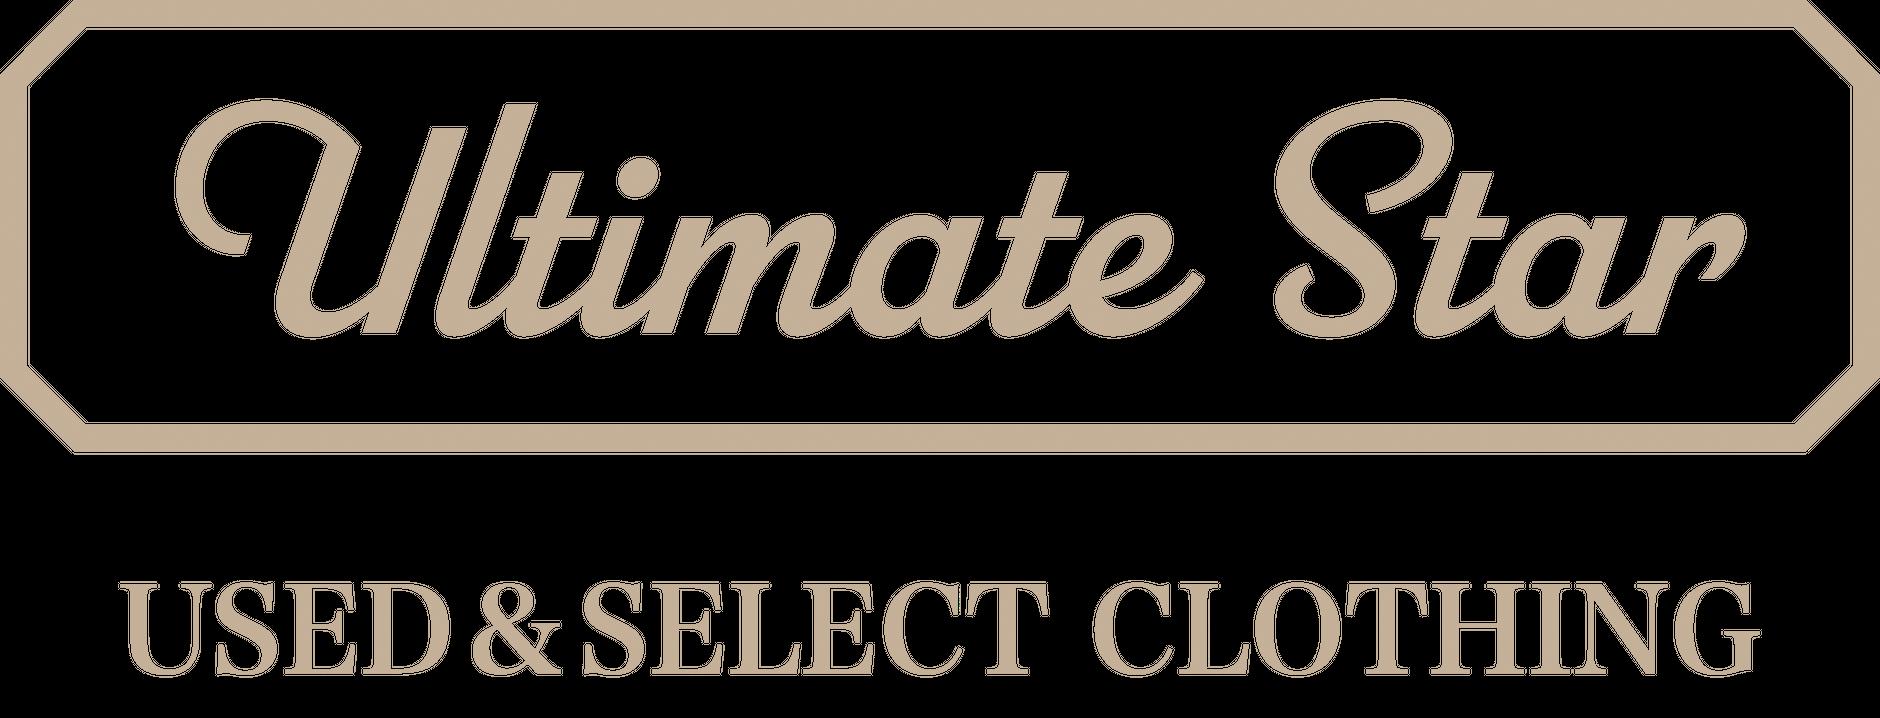 Ultimate Star